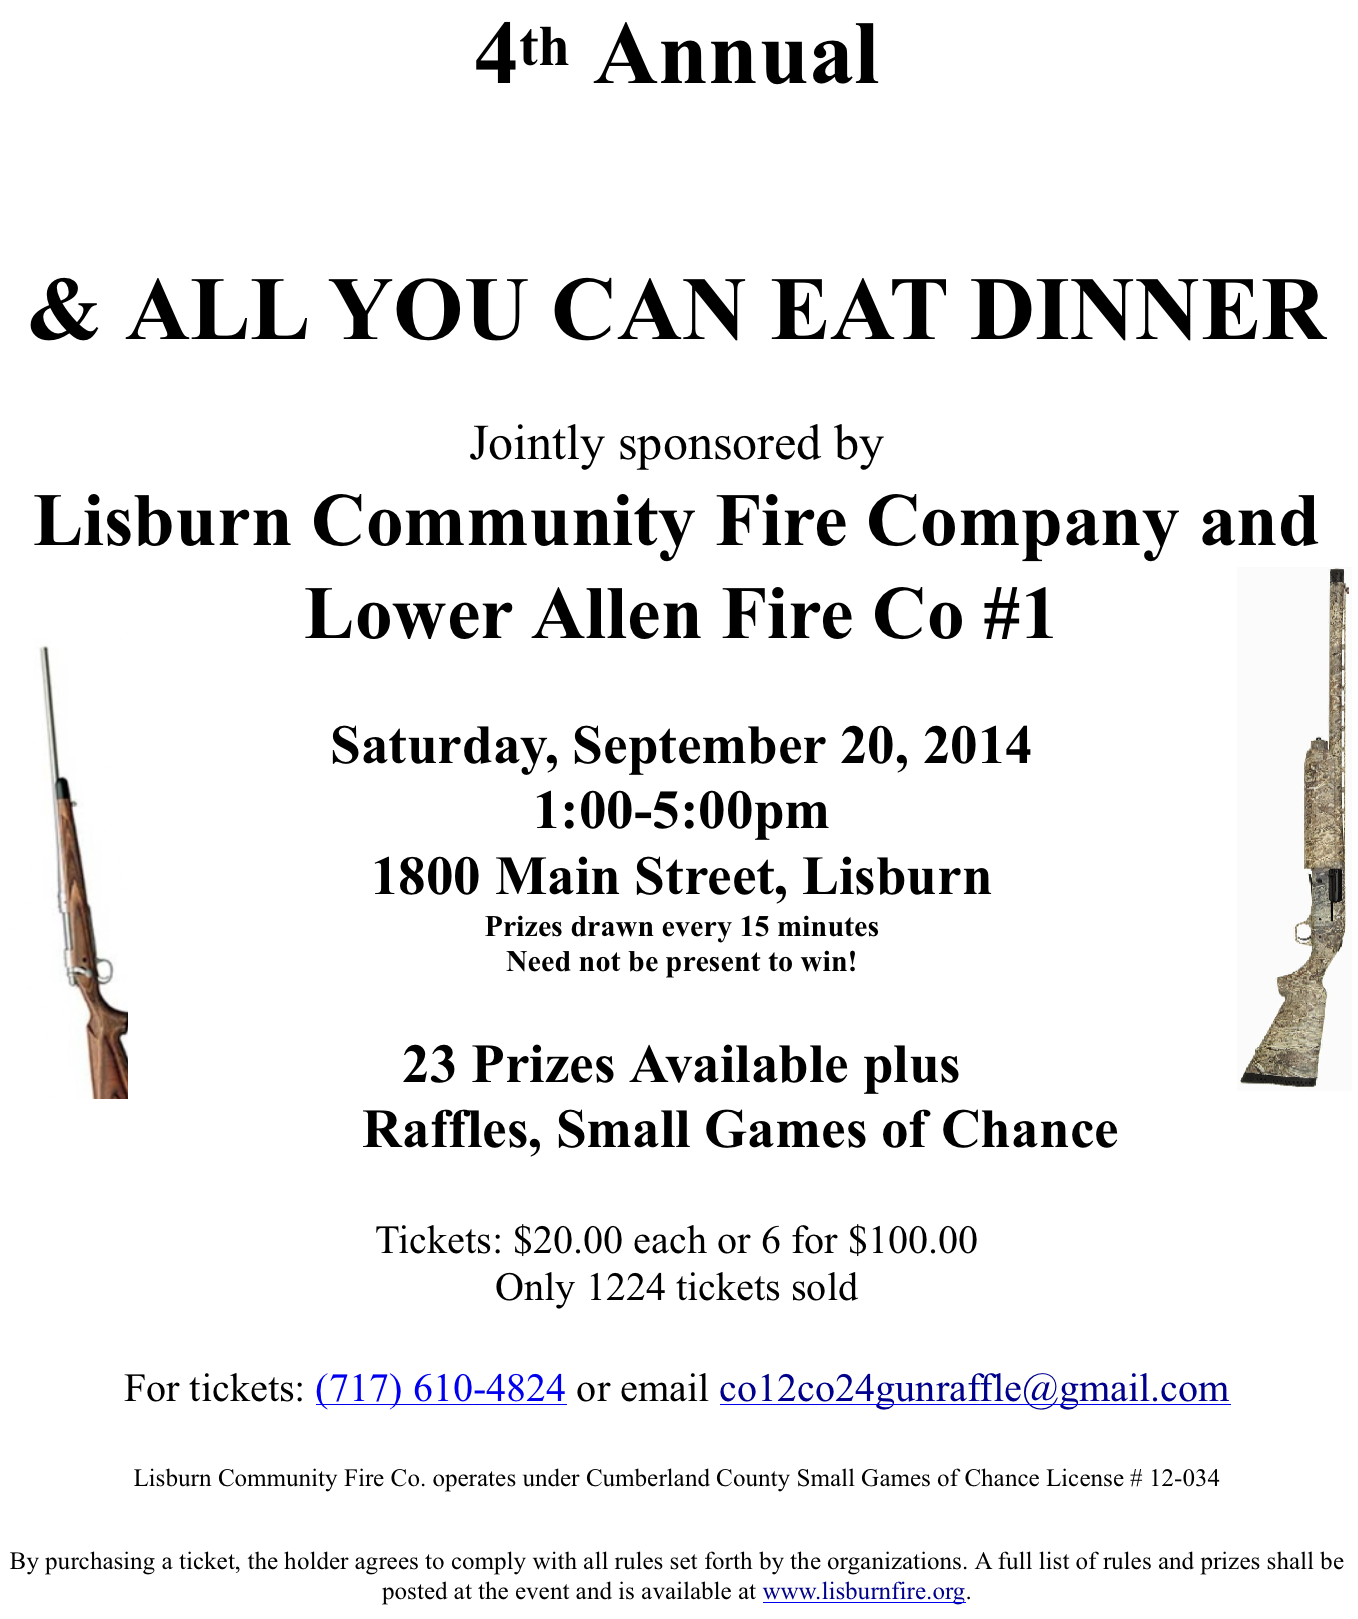 gun raffle tickets available  u2013 lisburn community fire company